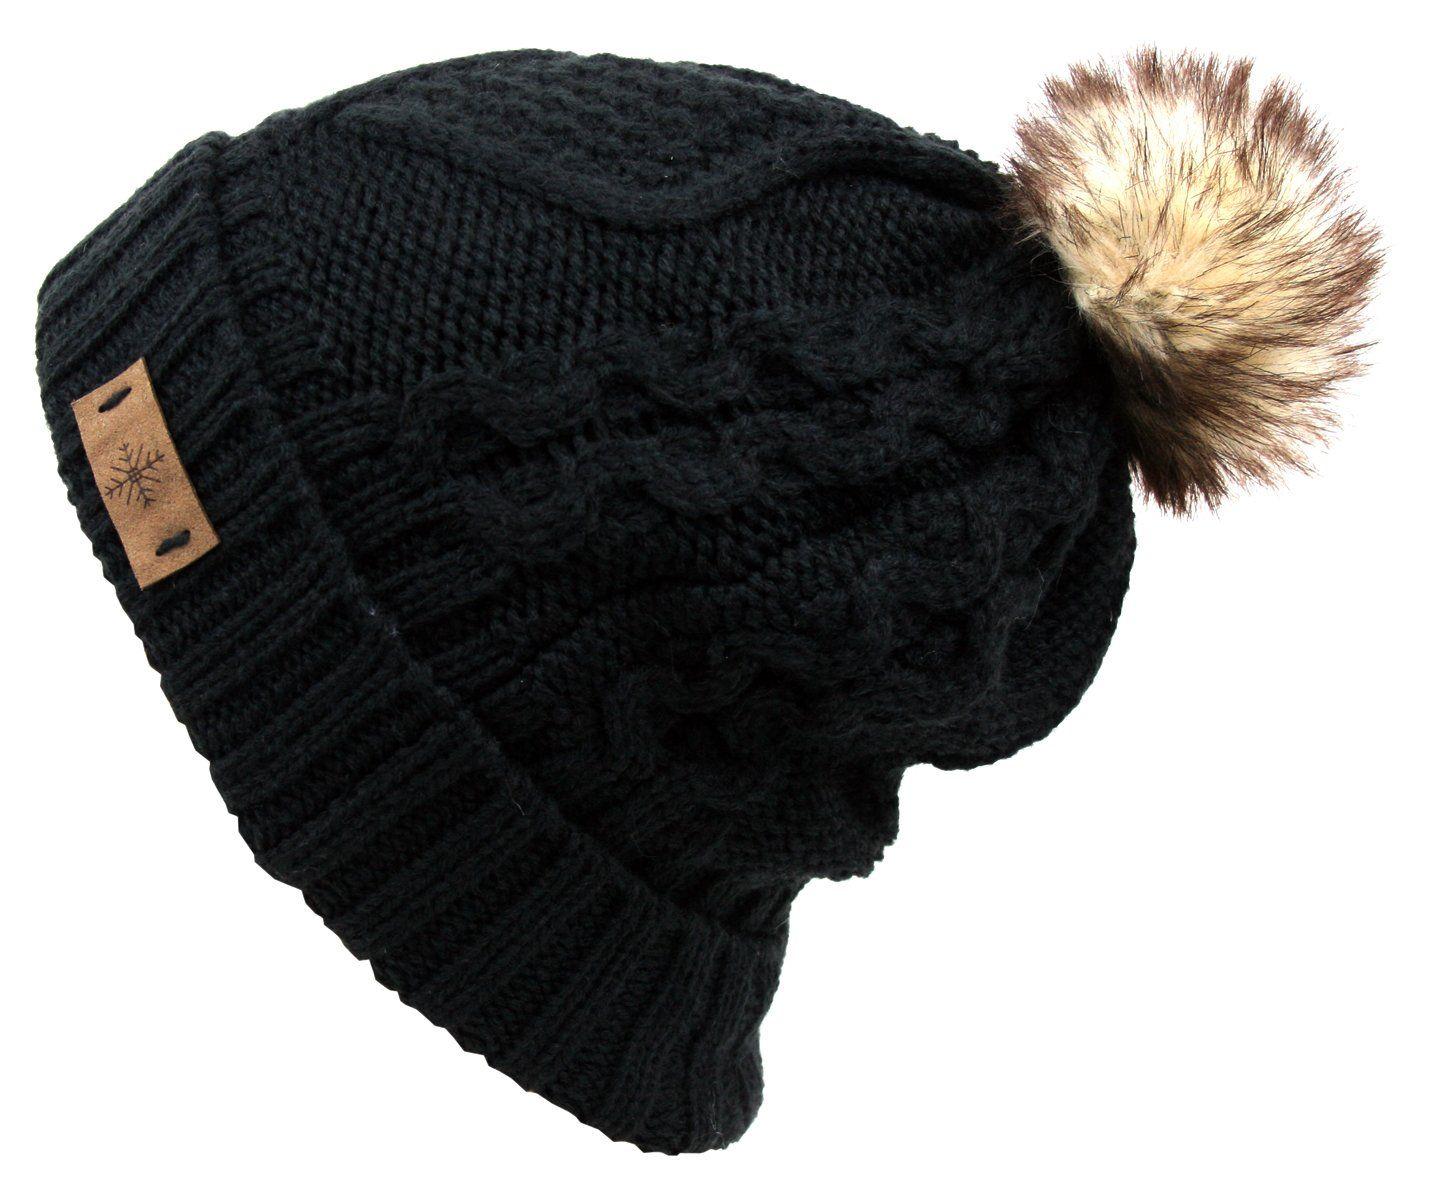 bfc80e975c4 Amazon.com  Women s Fur Pompom Fleece Lined Knitted Slouchy Beanie Hat  (BLACK)  Clothing